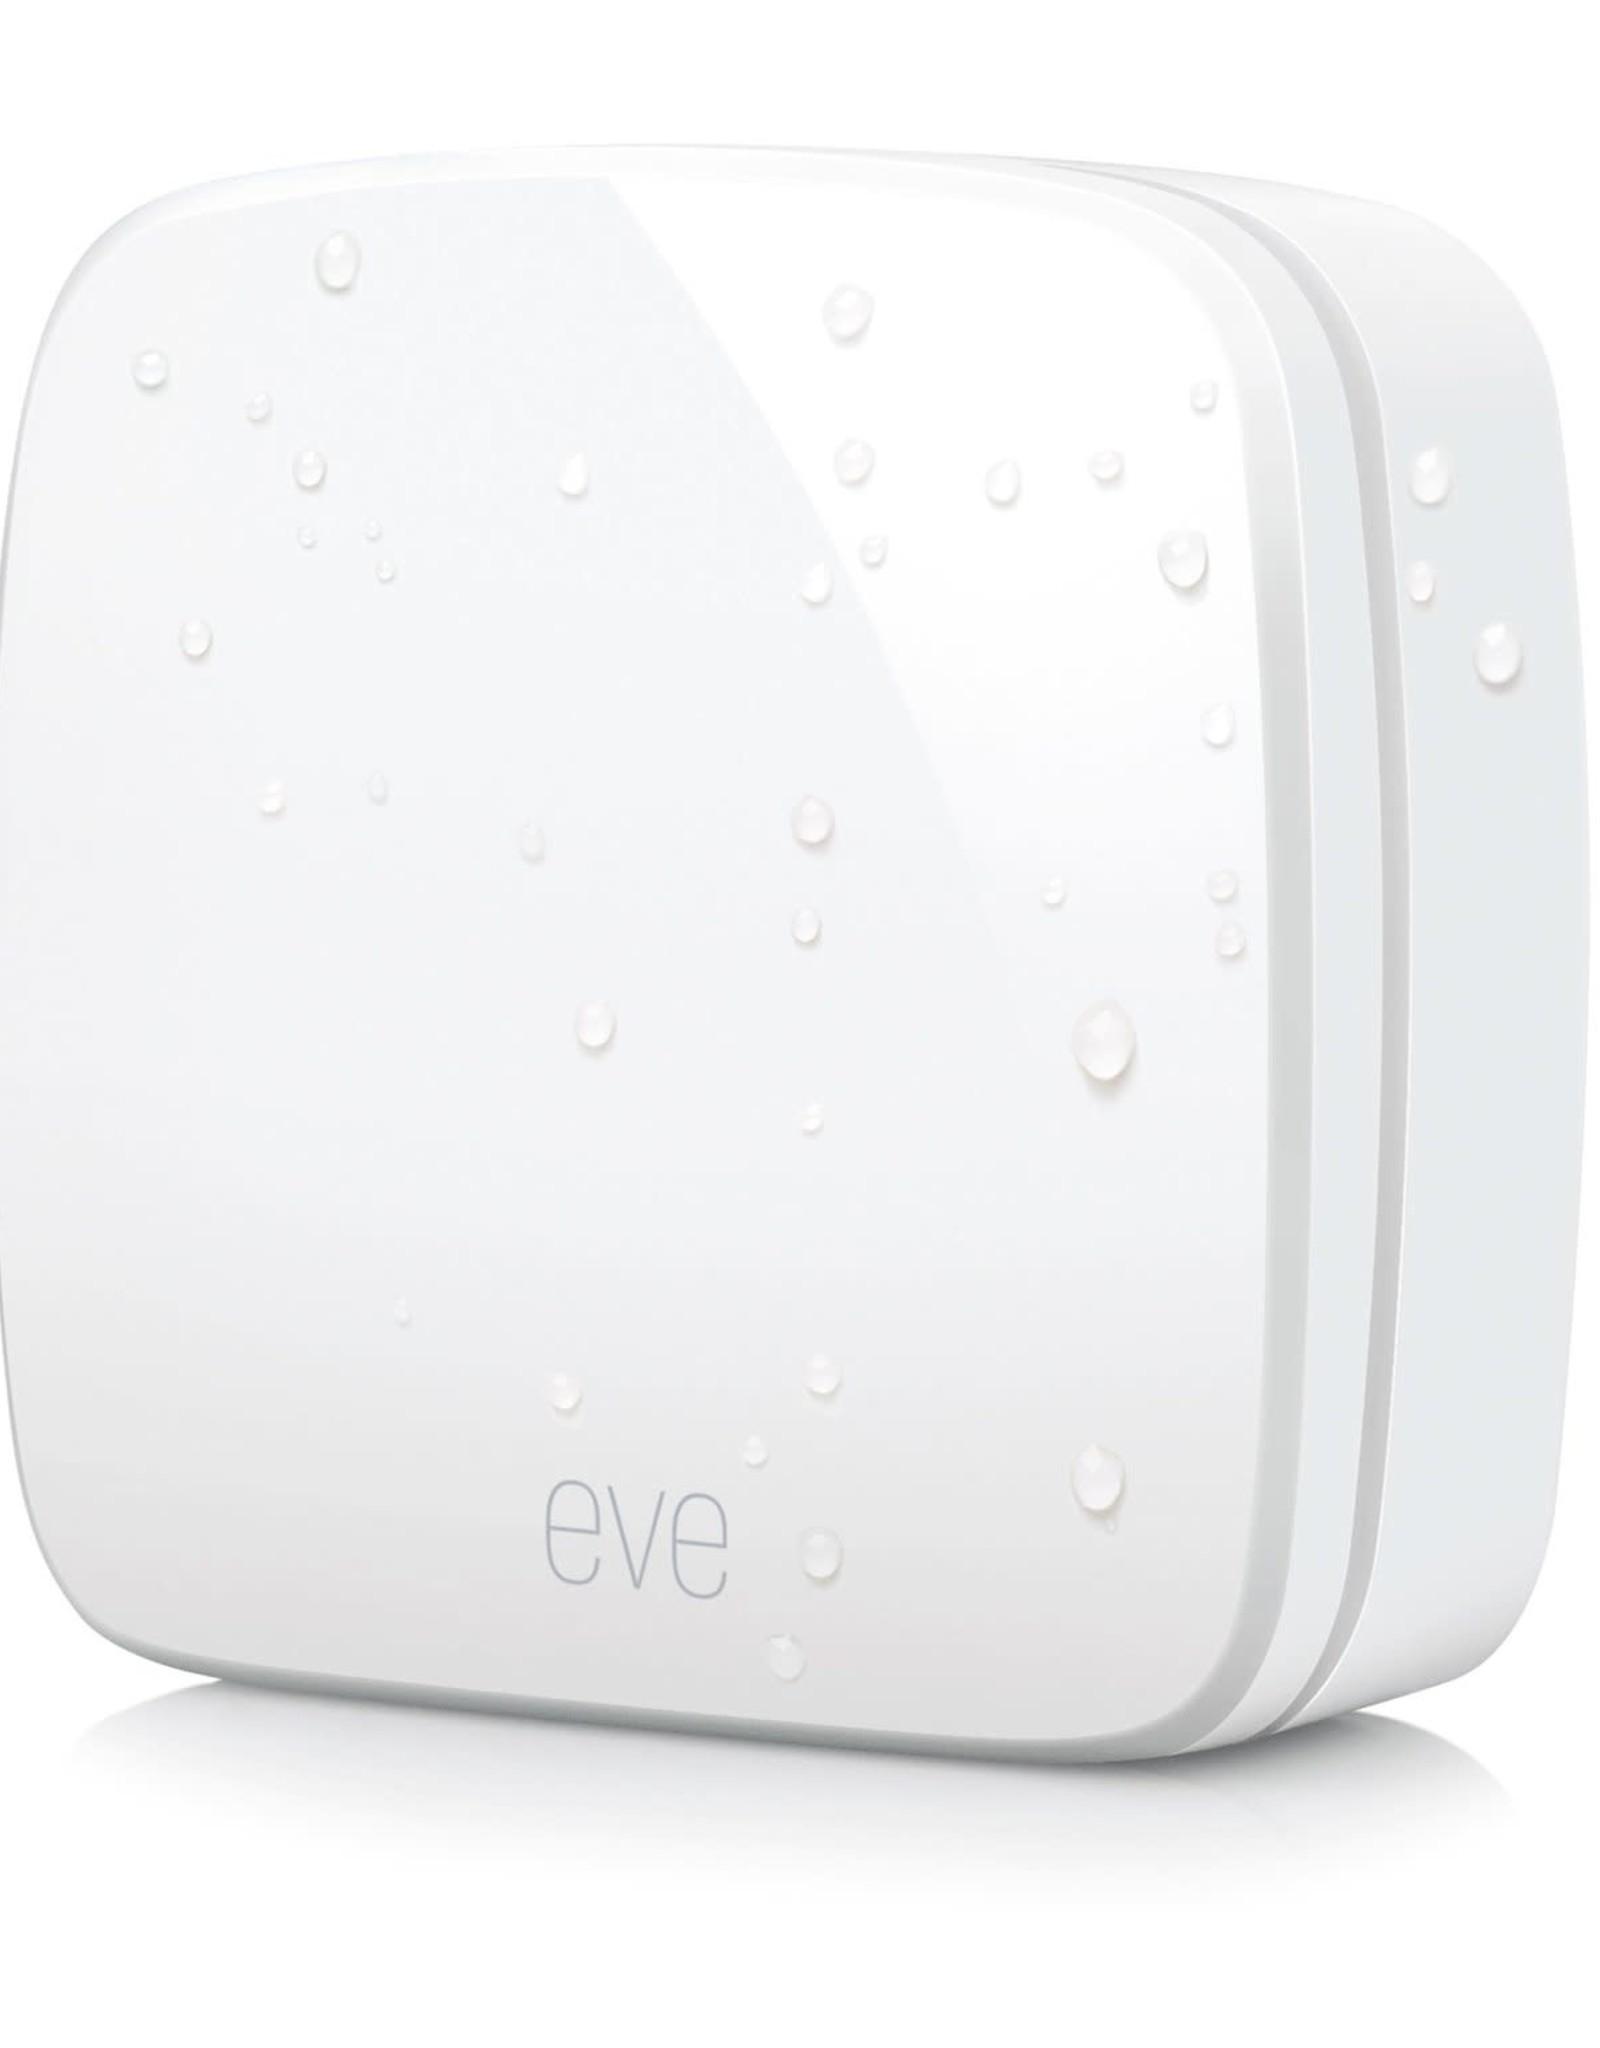 Elgato Eve Weather - Wireless Outdoor Sensor 5724397